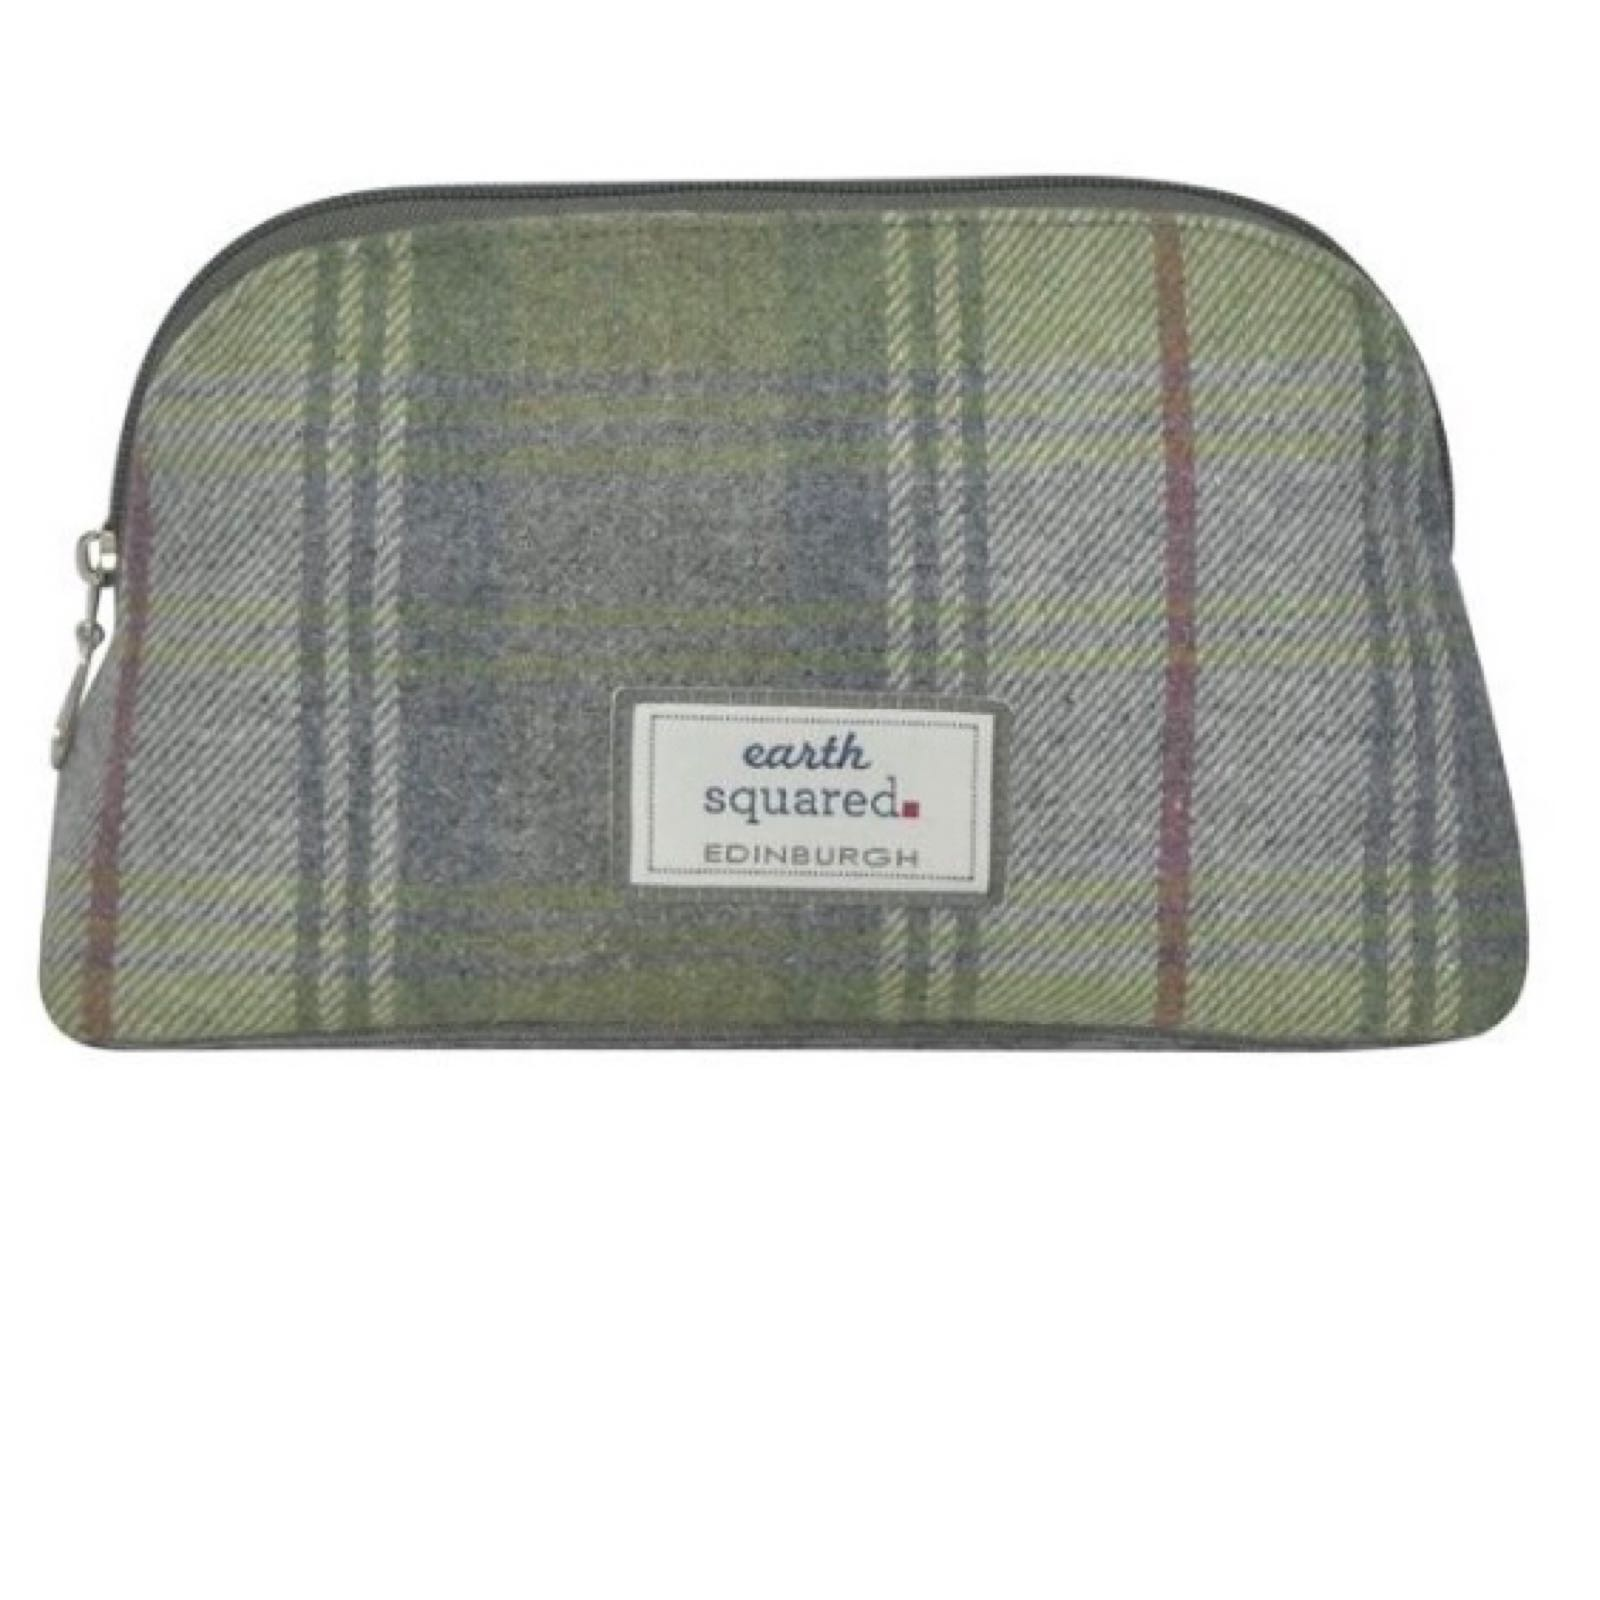 Earth Squared Toiletry Bag - Pebble Tweed